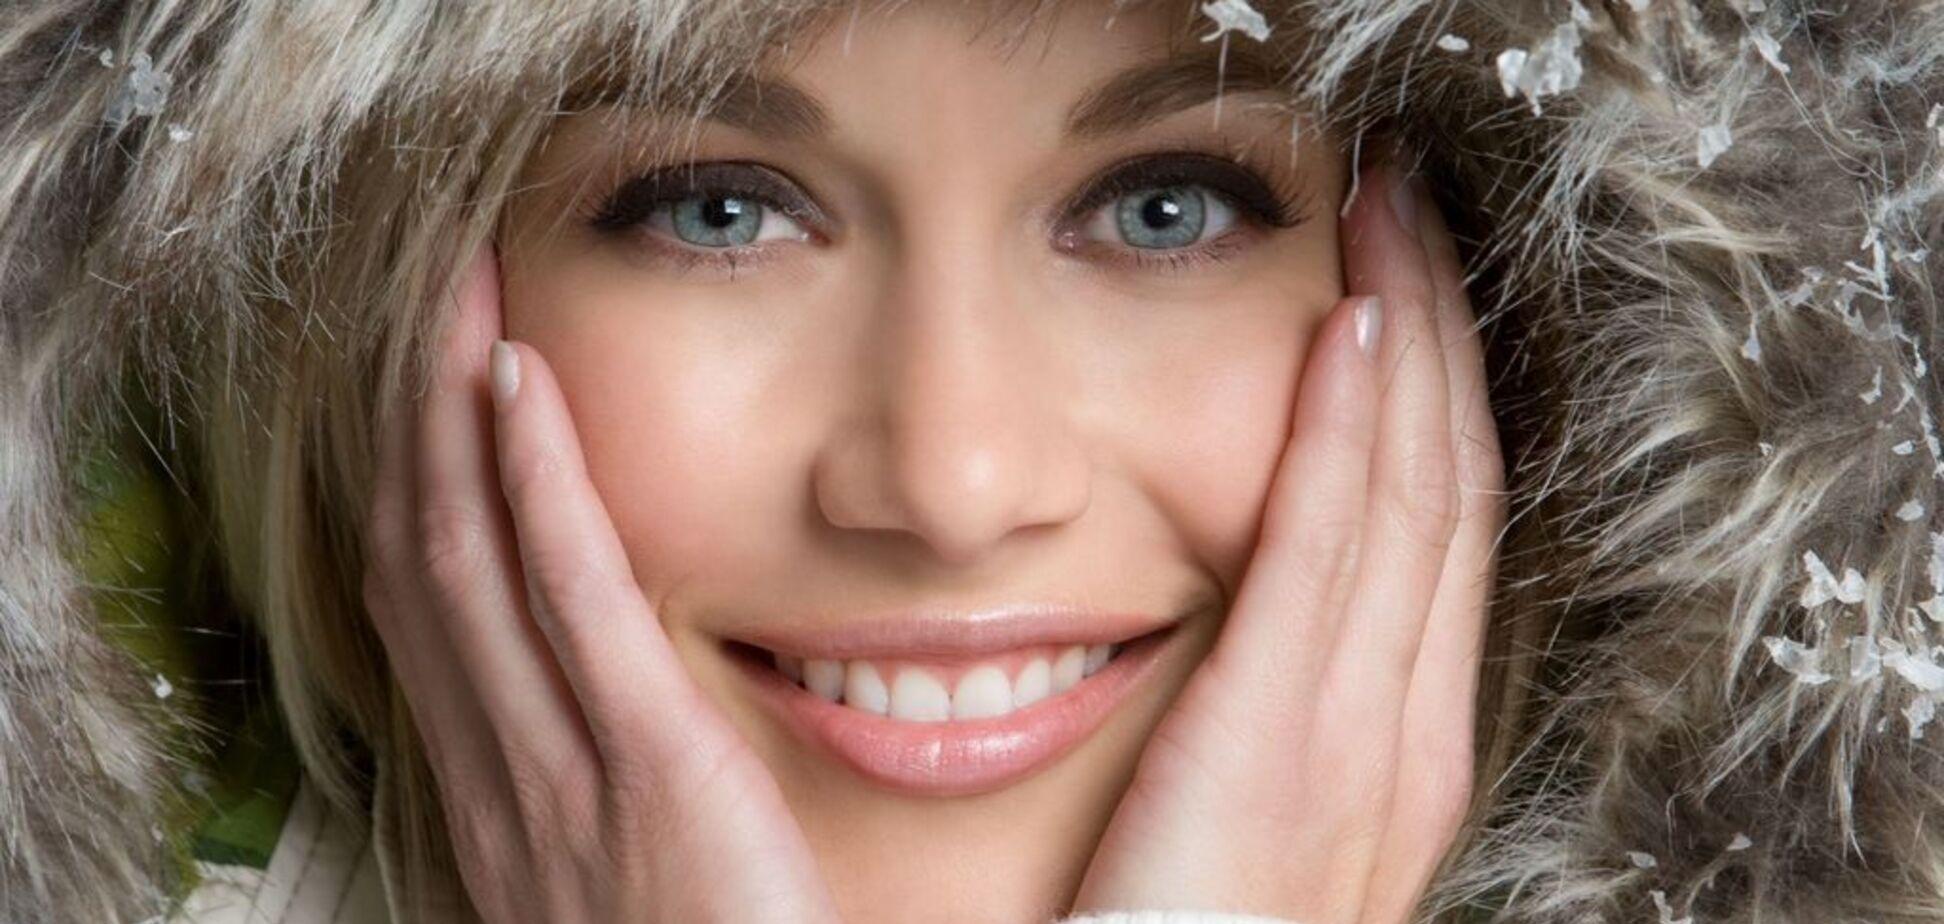 Уход за кожей в мороз и ветер